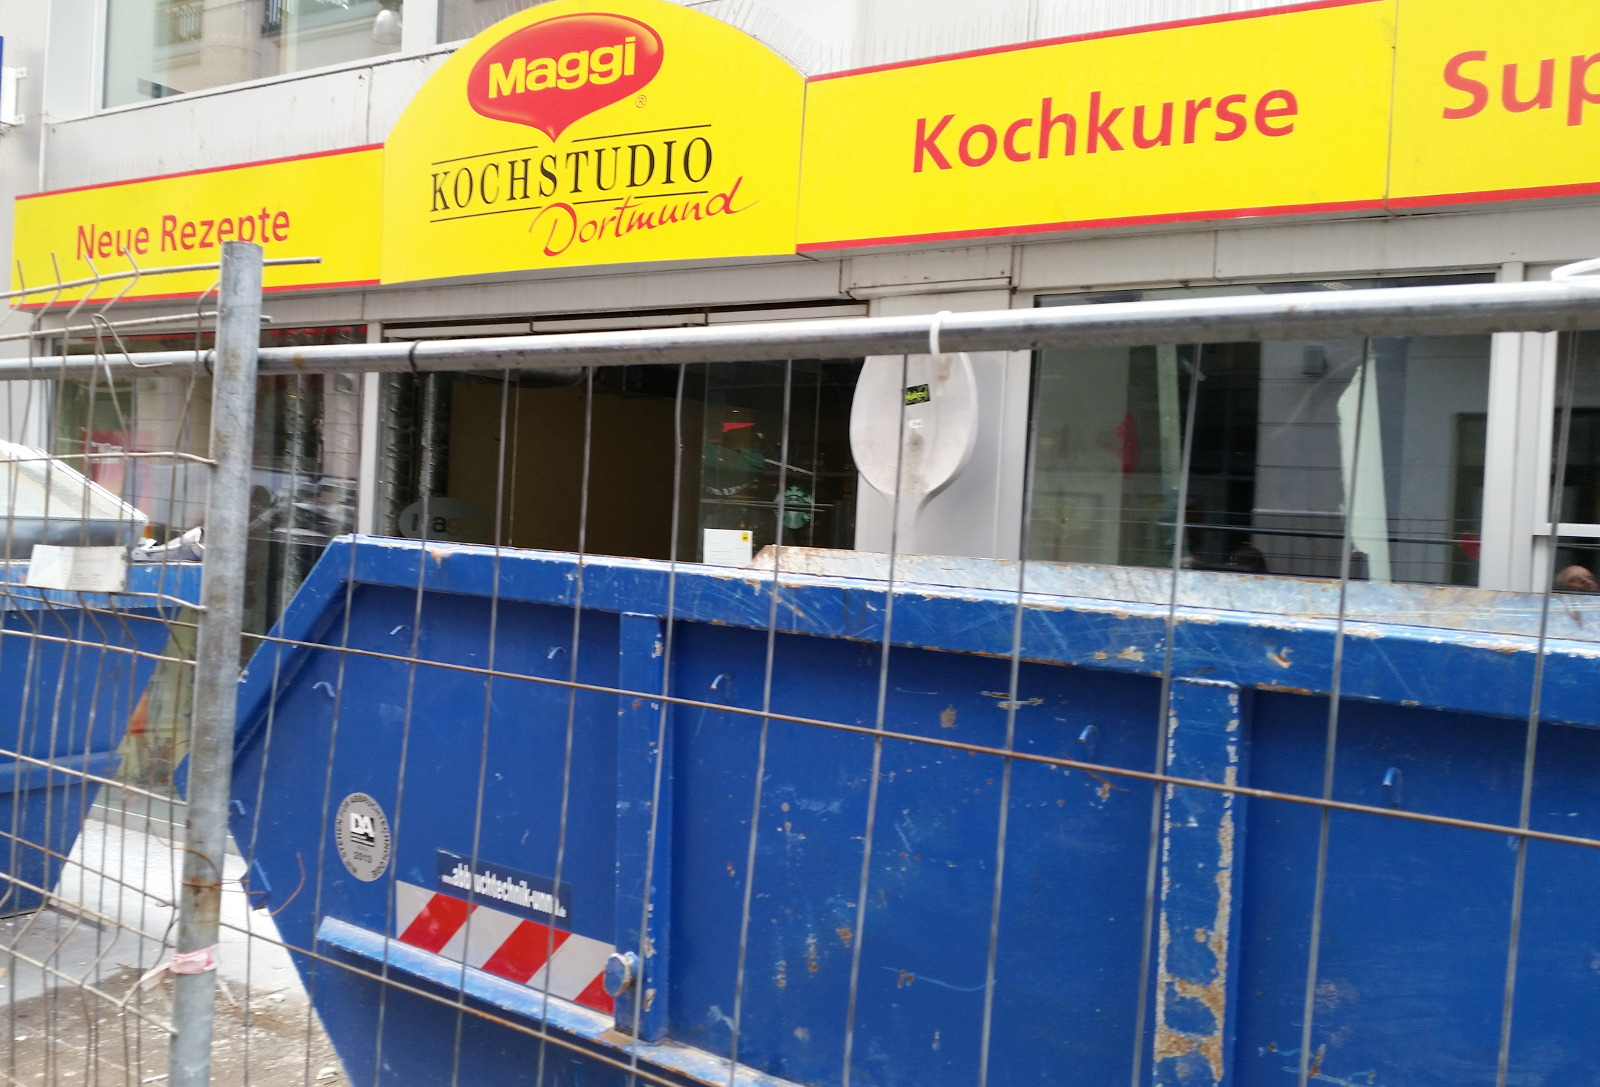 Maggi Kochstudio in Dortmund – nur Baustelle keine Kochkurse ... | {Maggi kochstudio 44}